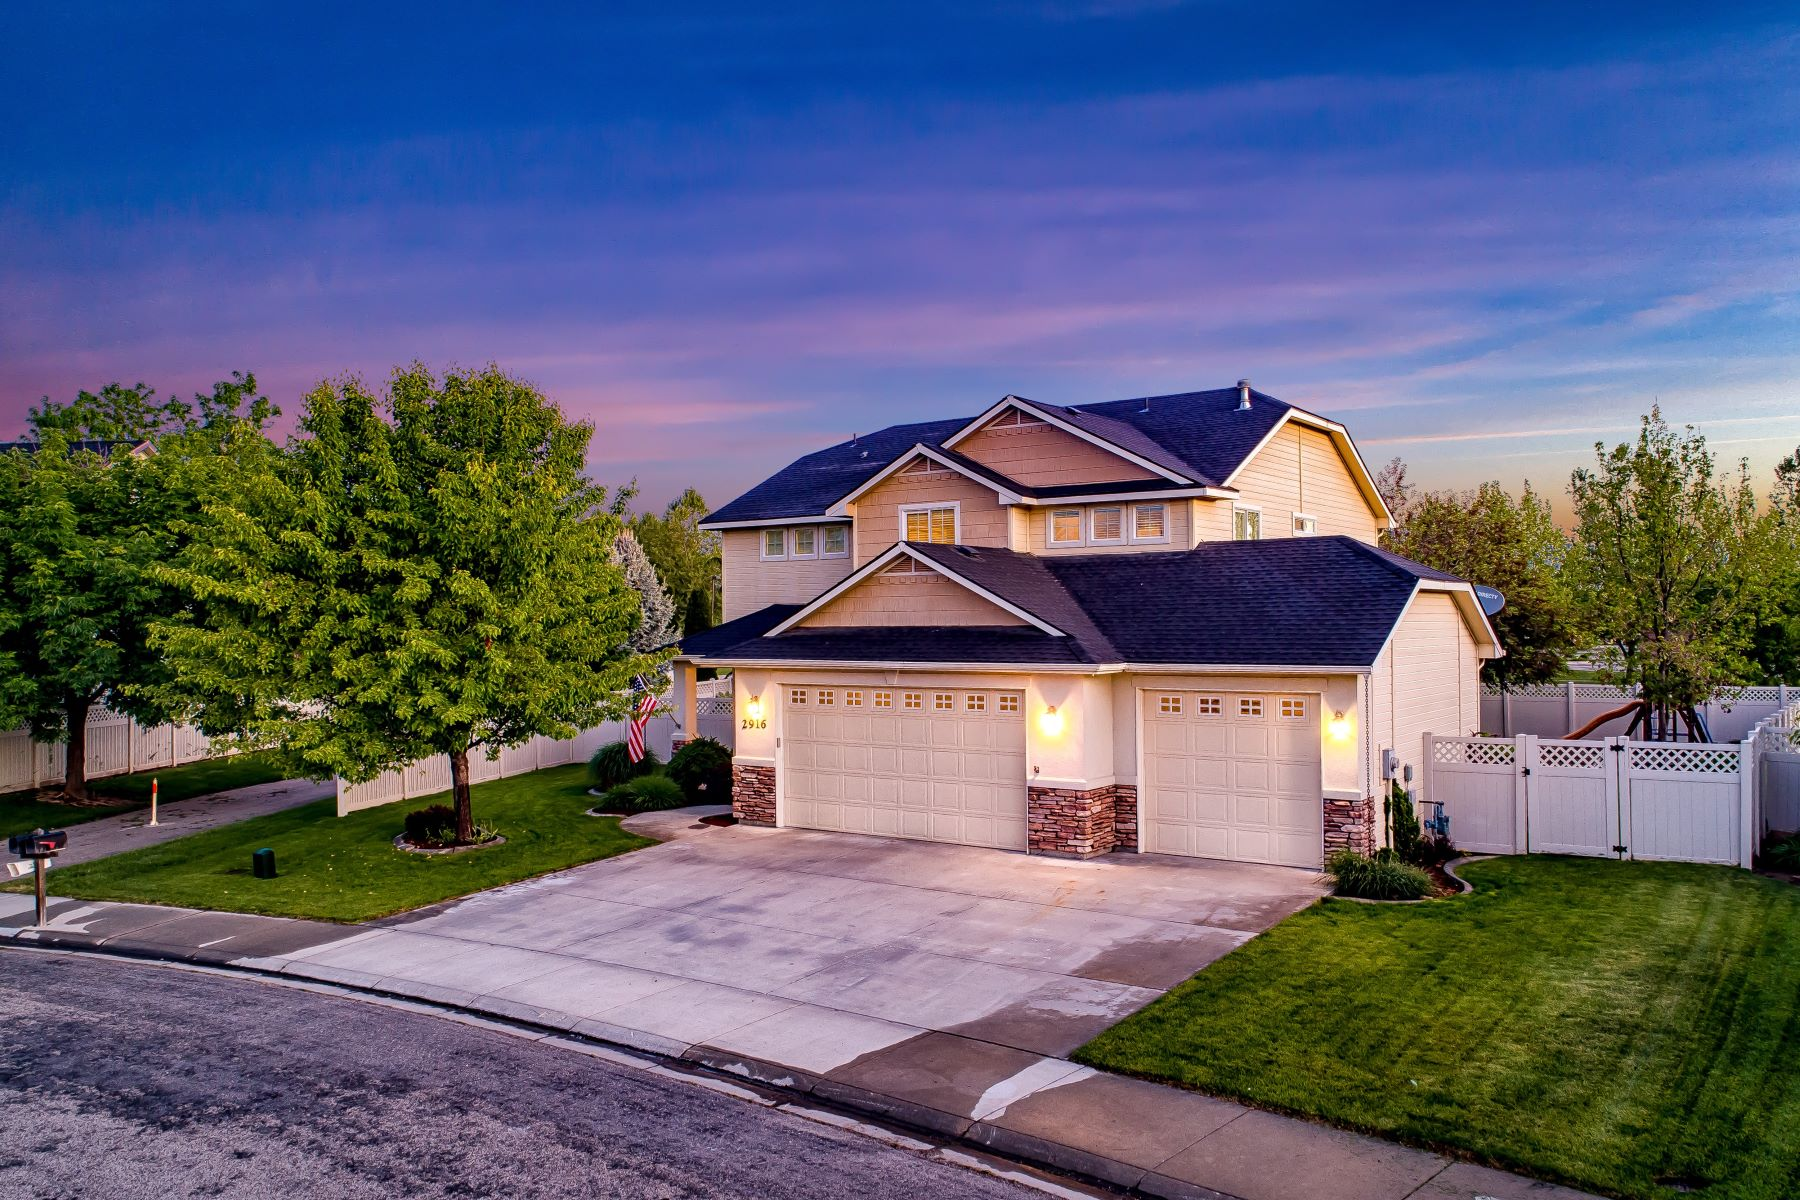 Single Family Homes for Sale at 2916 Ravenna Meridian, Idaho 83646 United States